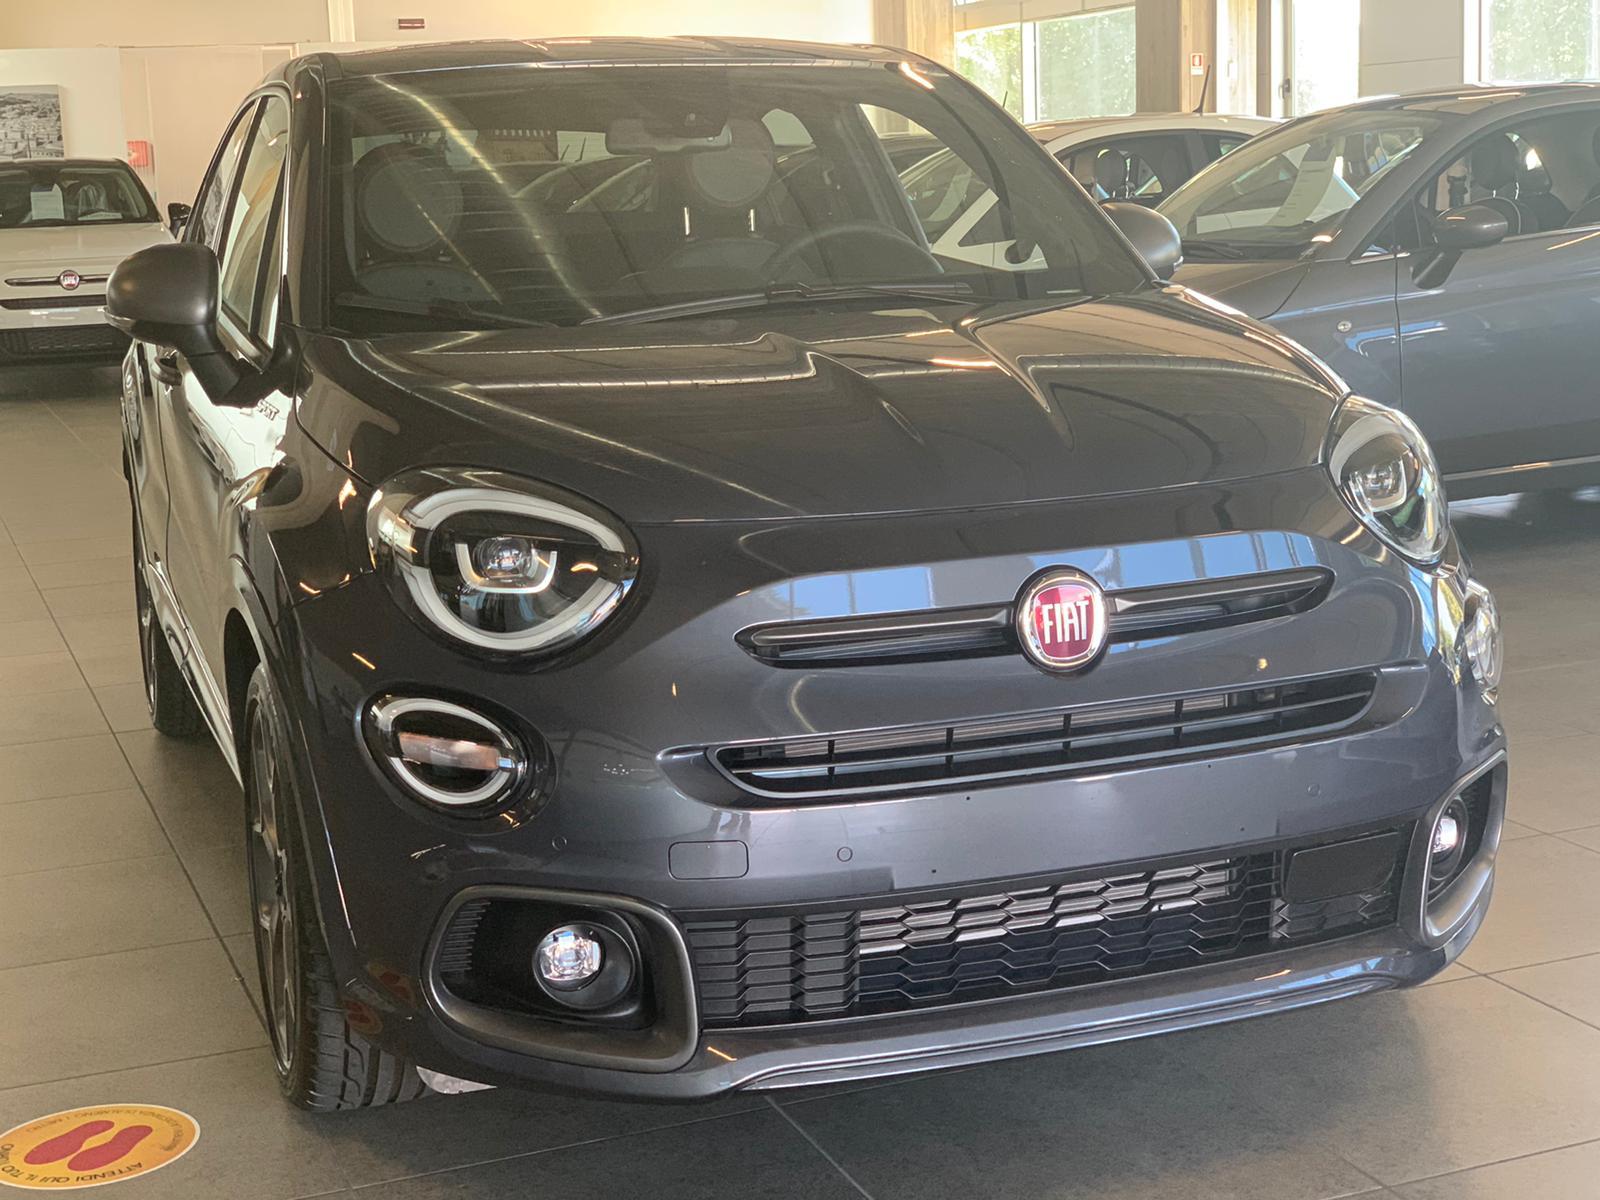 Promo Fiat 500x Motorgold Bologna Srl